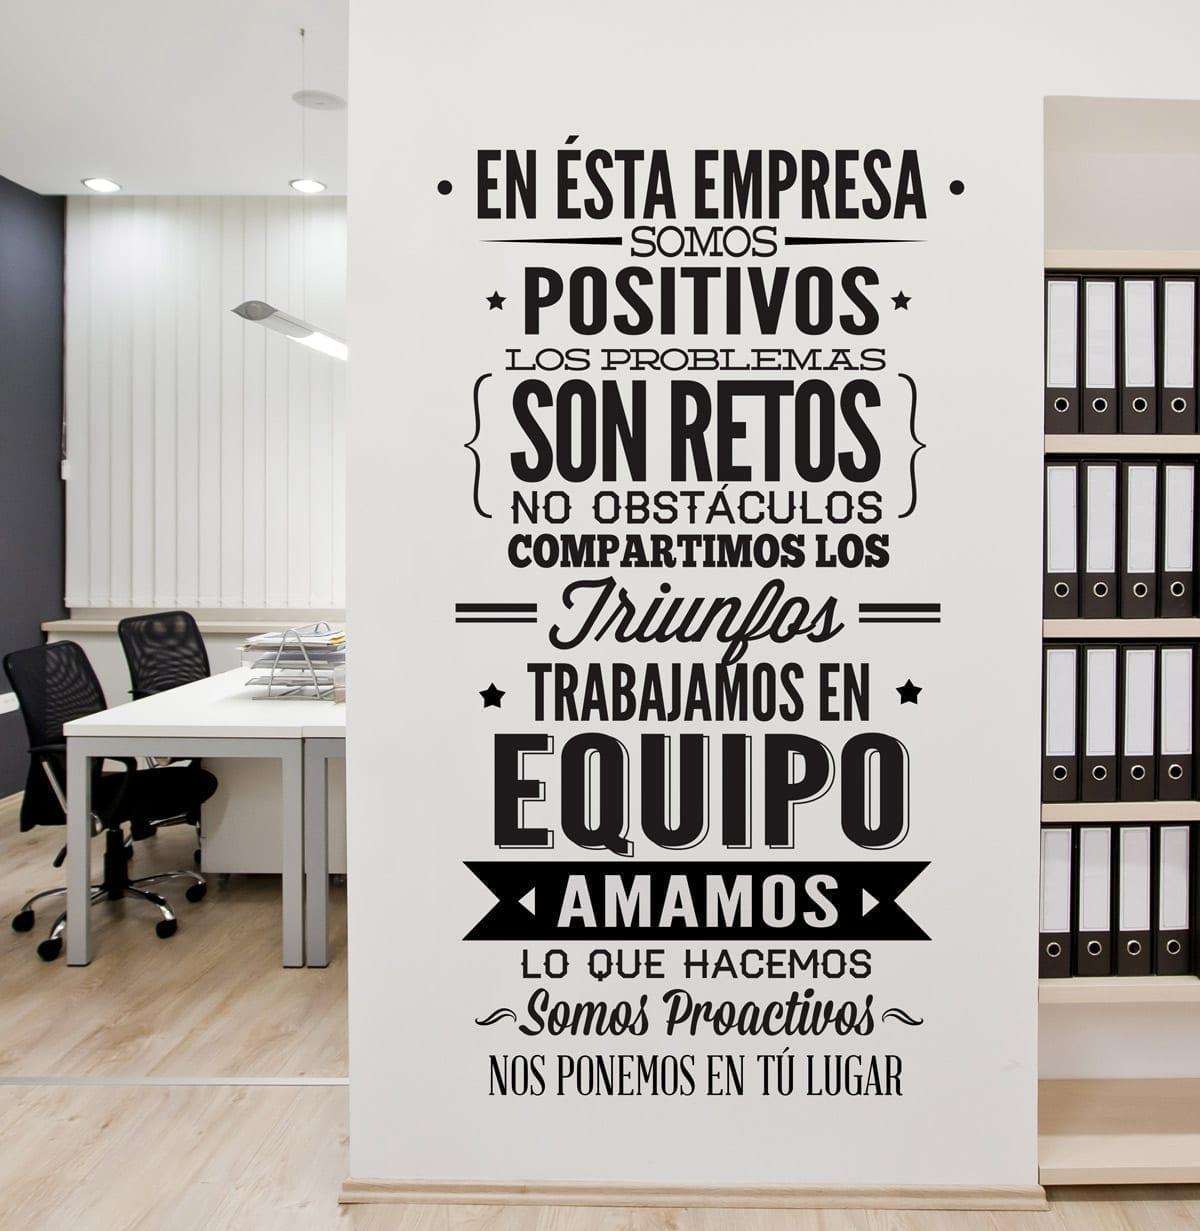 Decoracion oficina good ideas para renovar la oficina for Decoracion oficina